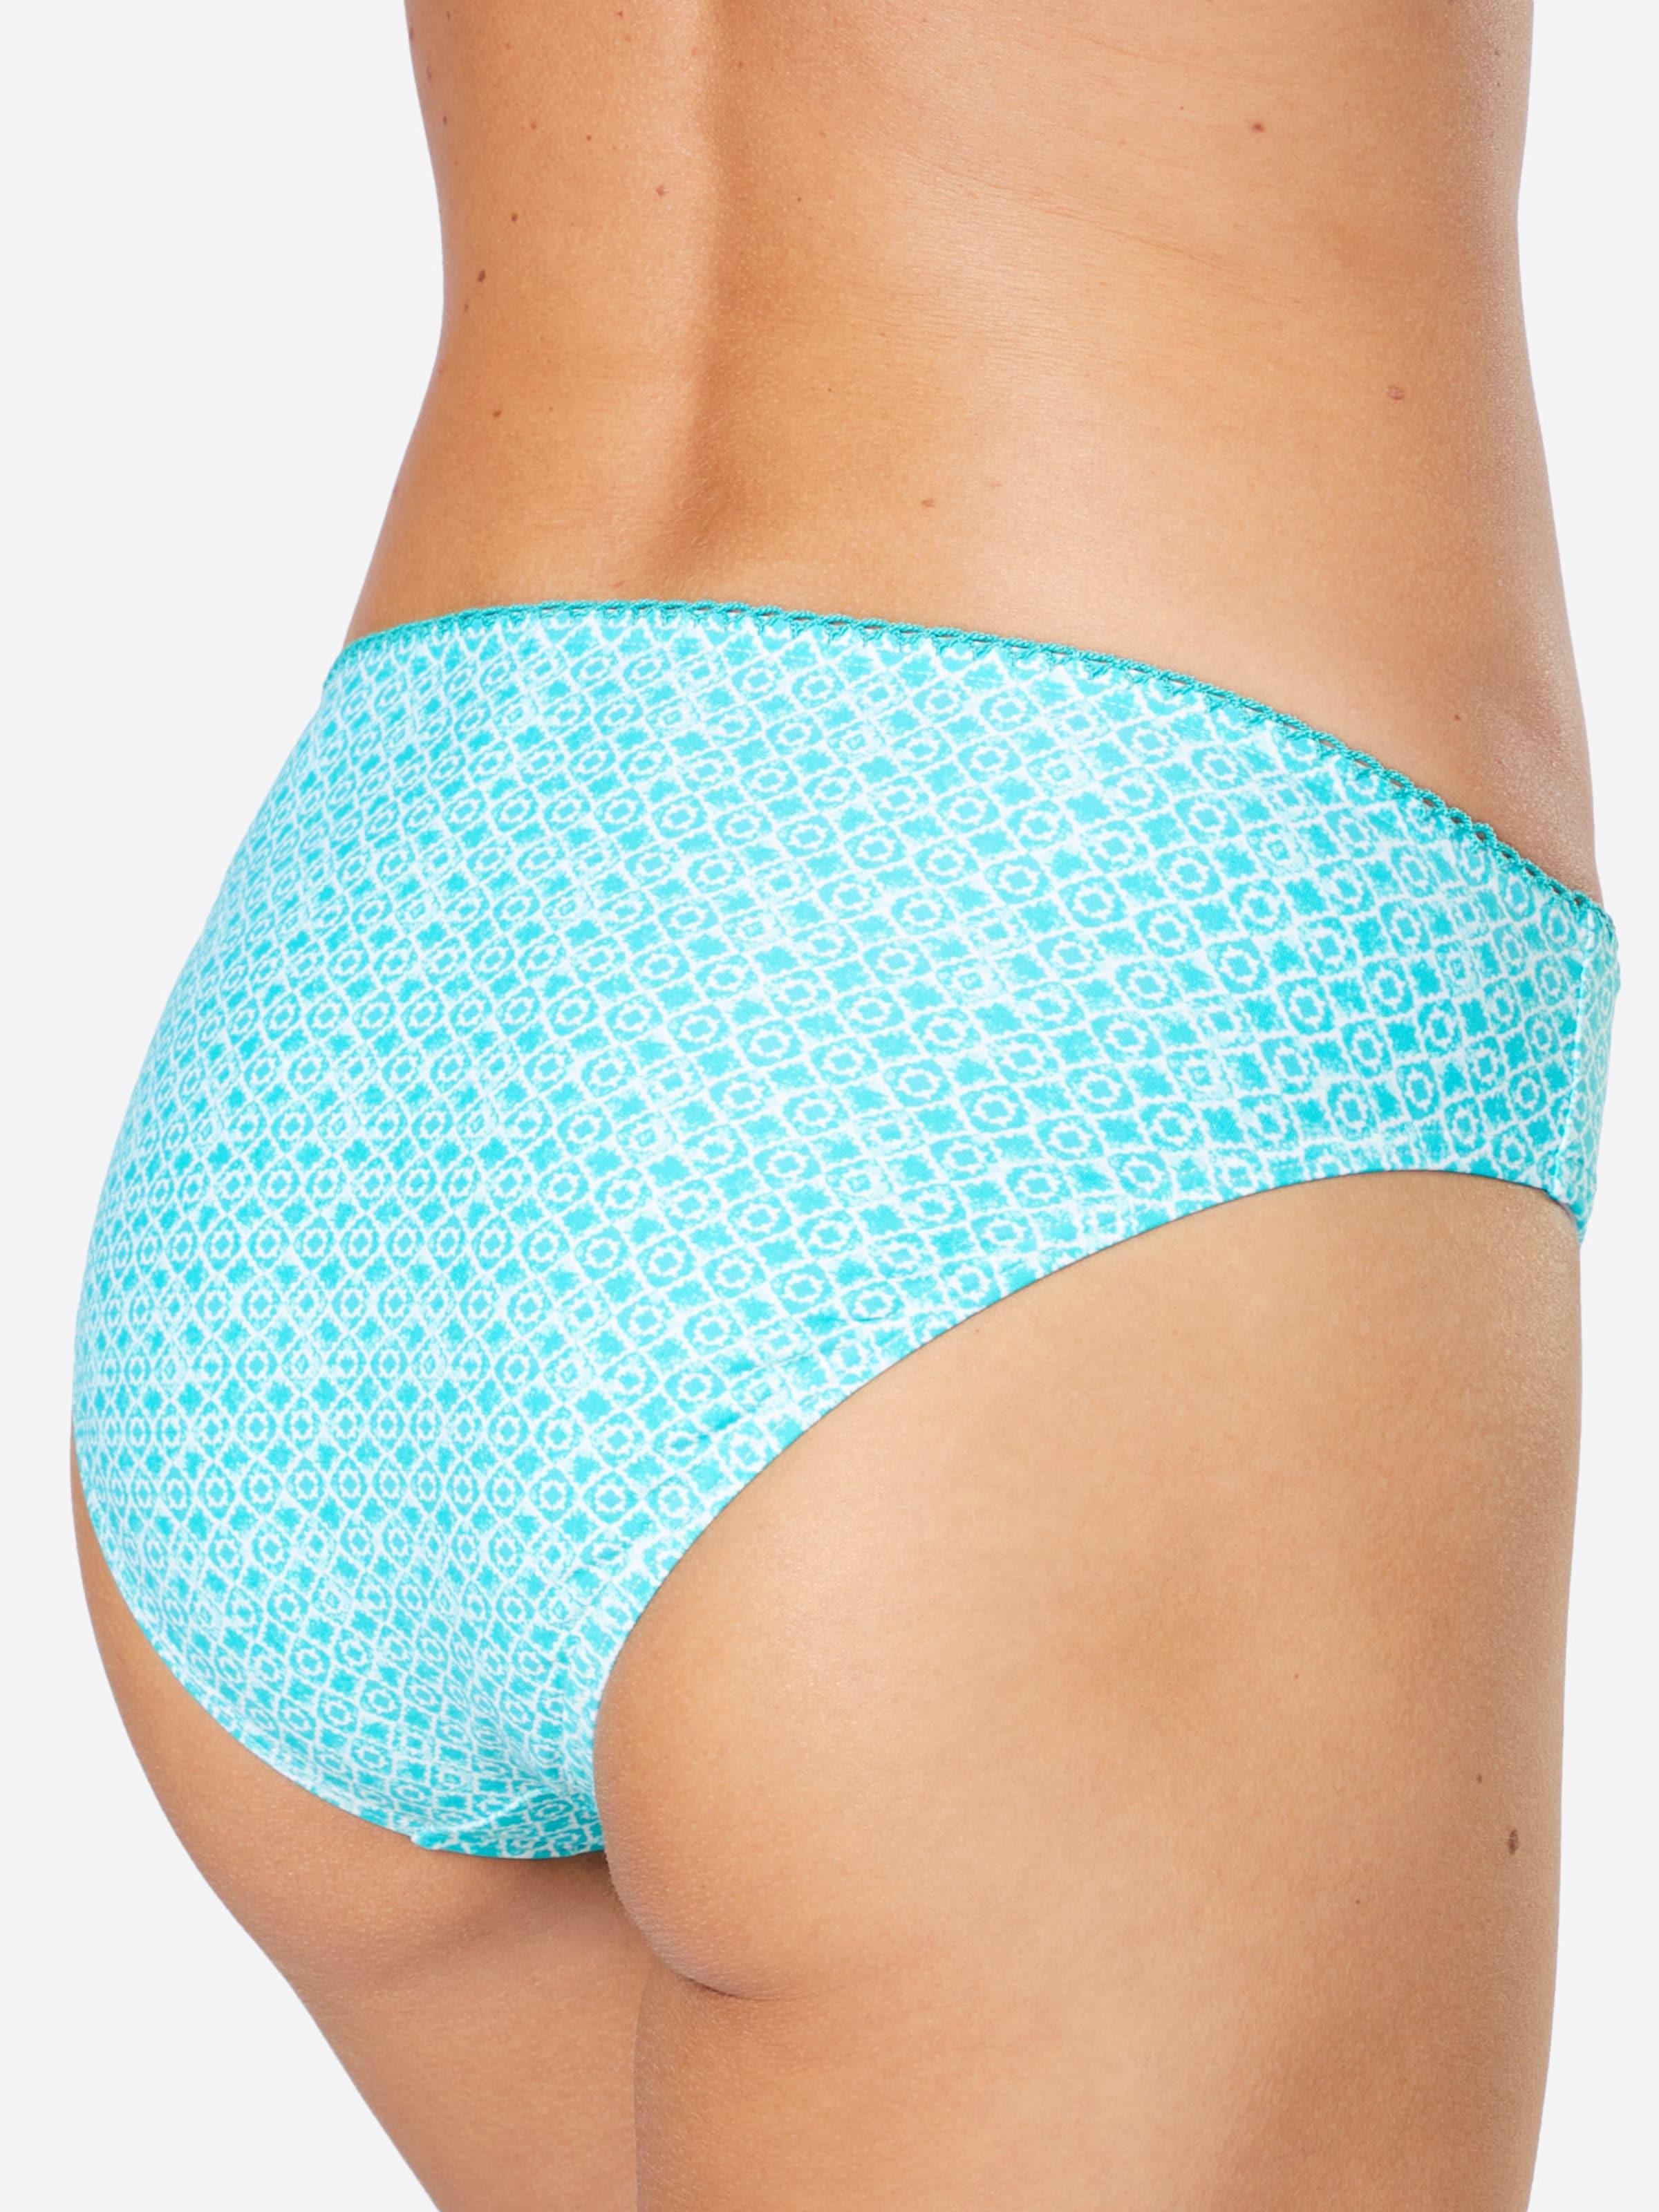 'sapphire En Bikini Bas Beach' TurquoiseBlanc Esprit De E2IYWDH9